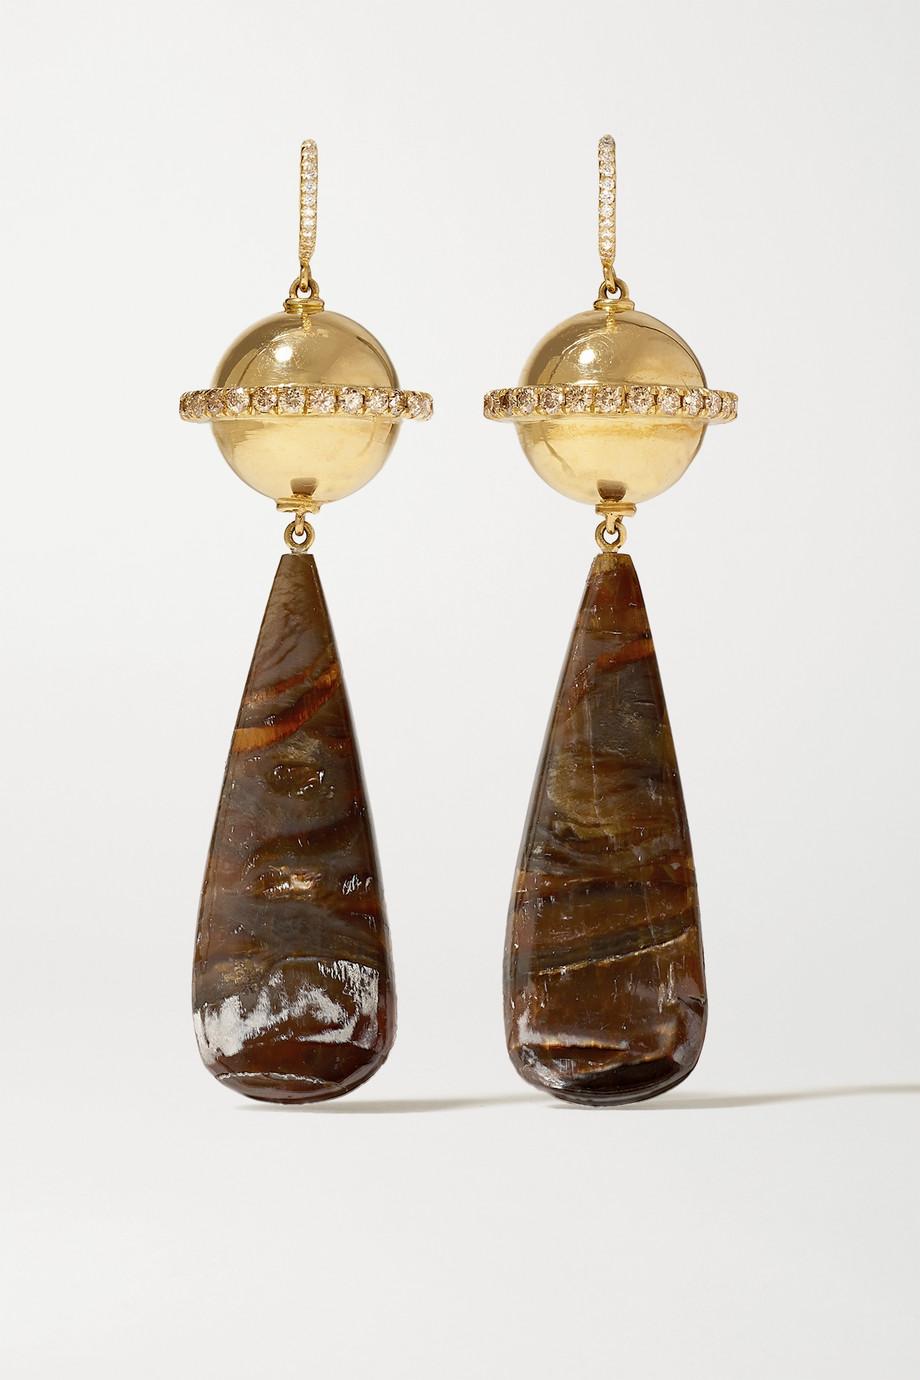 Guita M 18-karat gold, serpentine opal and diamond earrings